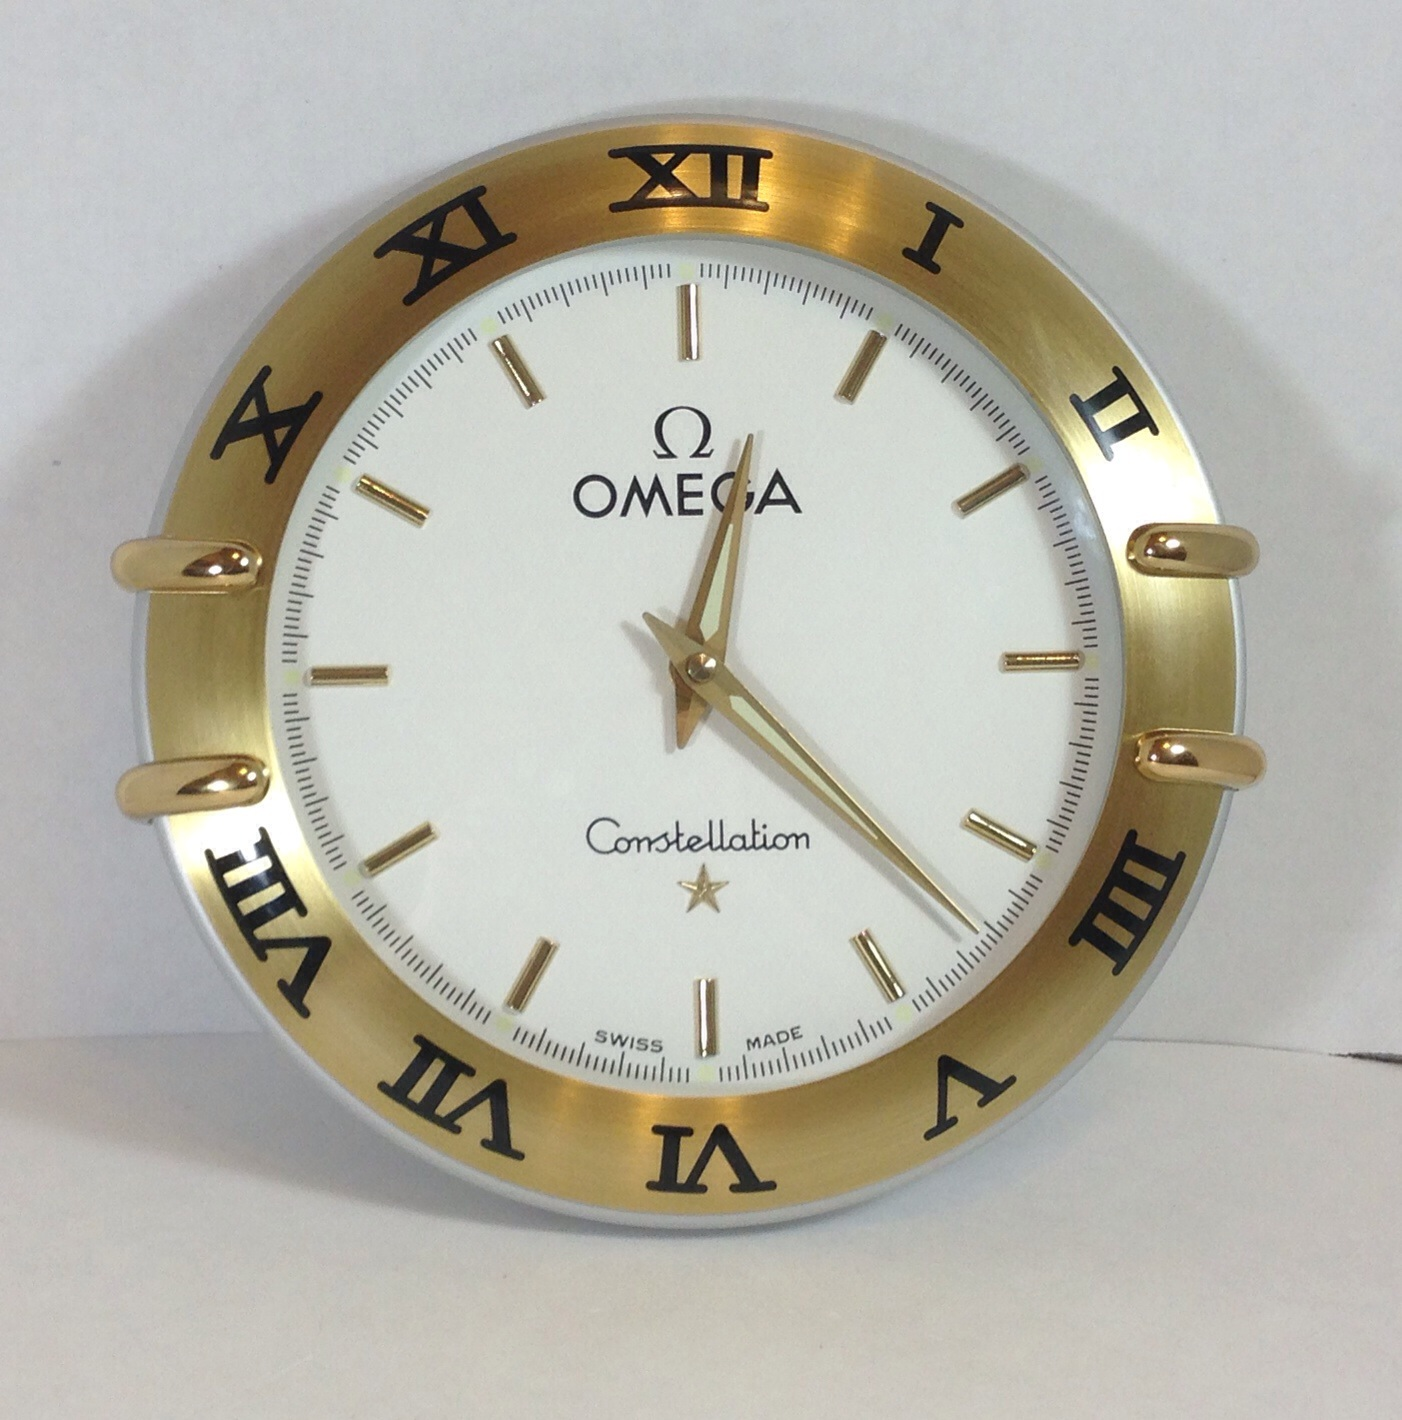 Omega constellation wall clock help omega forums imageg amipublicfo Gallery